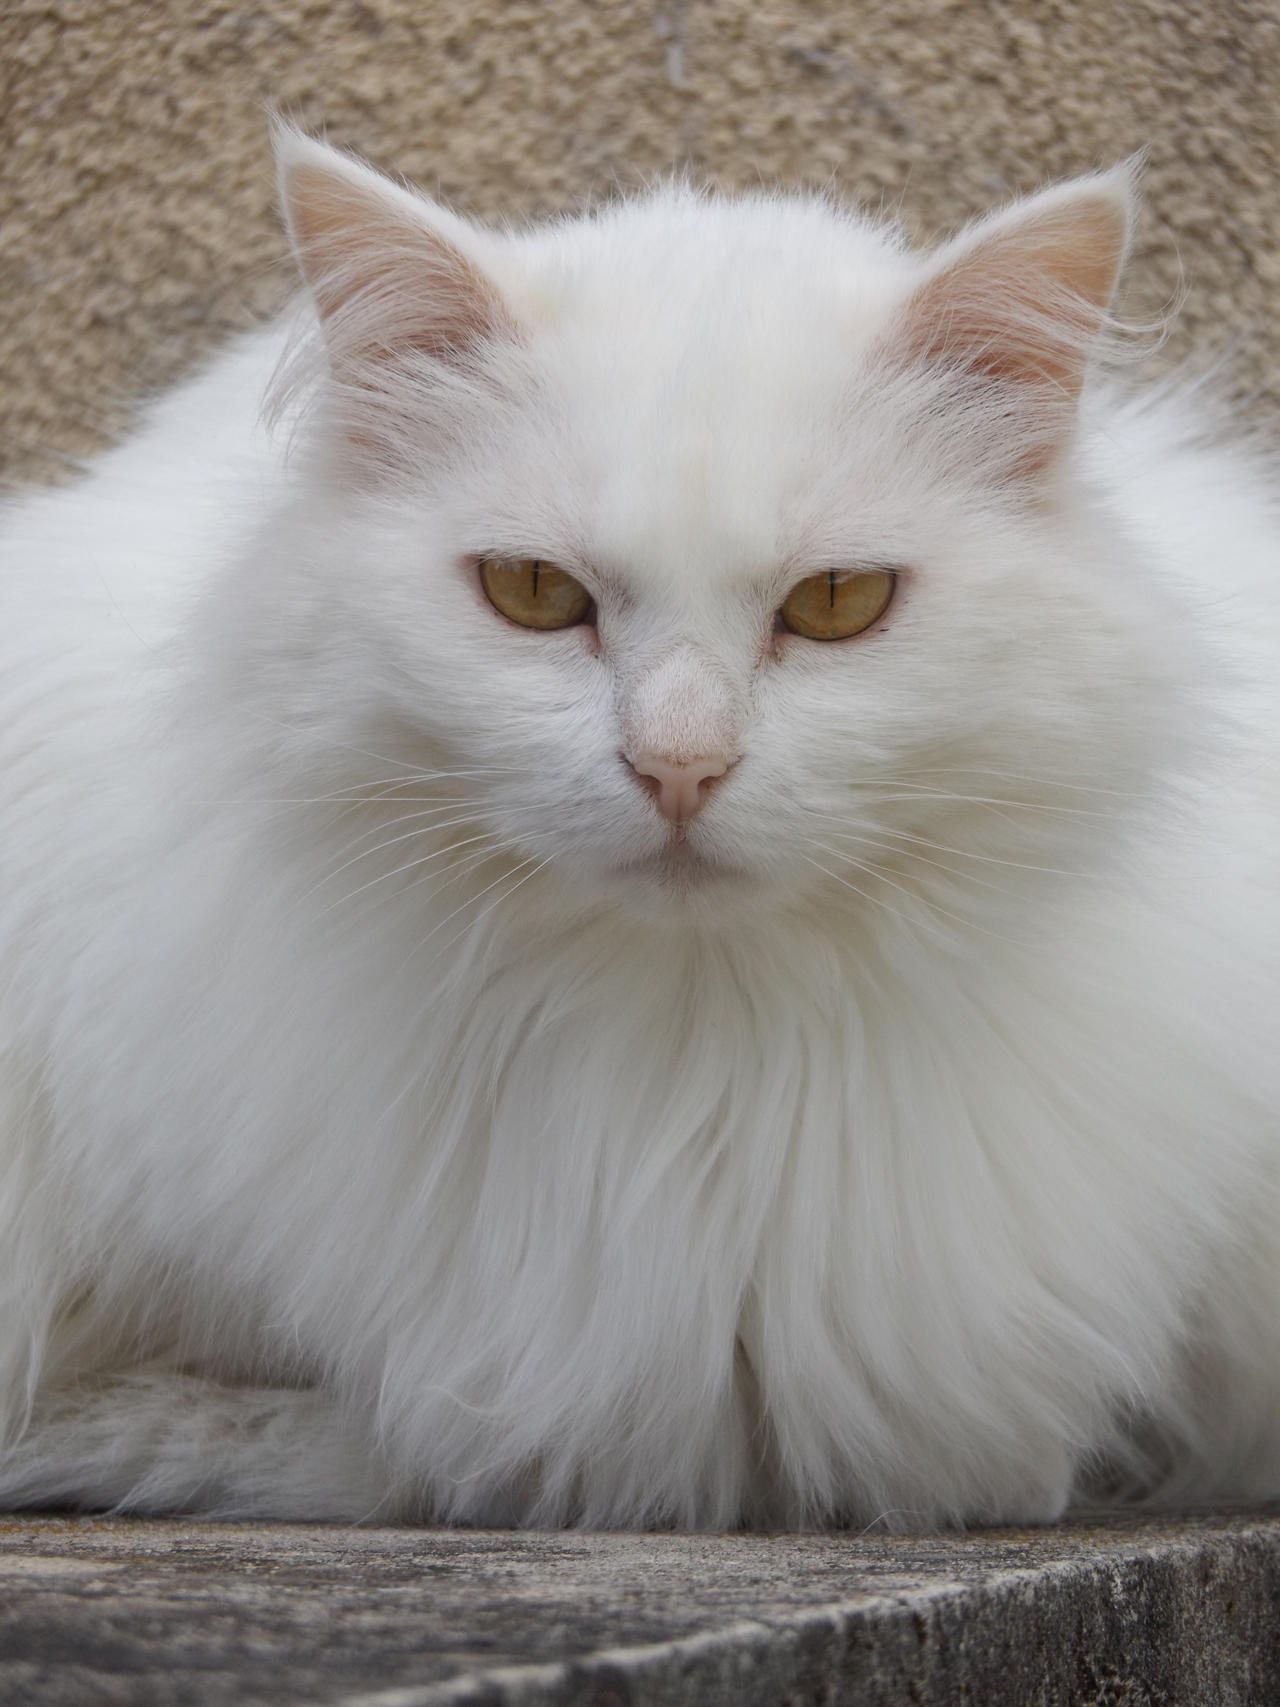 Cat 1 by Alphagoth